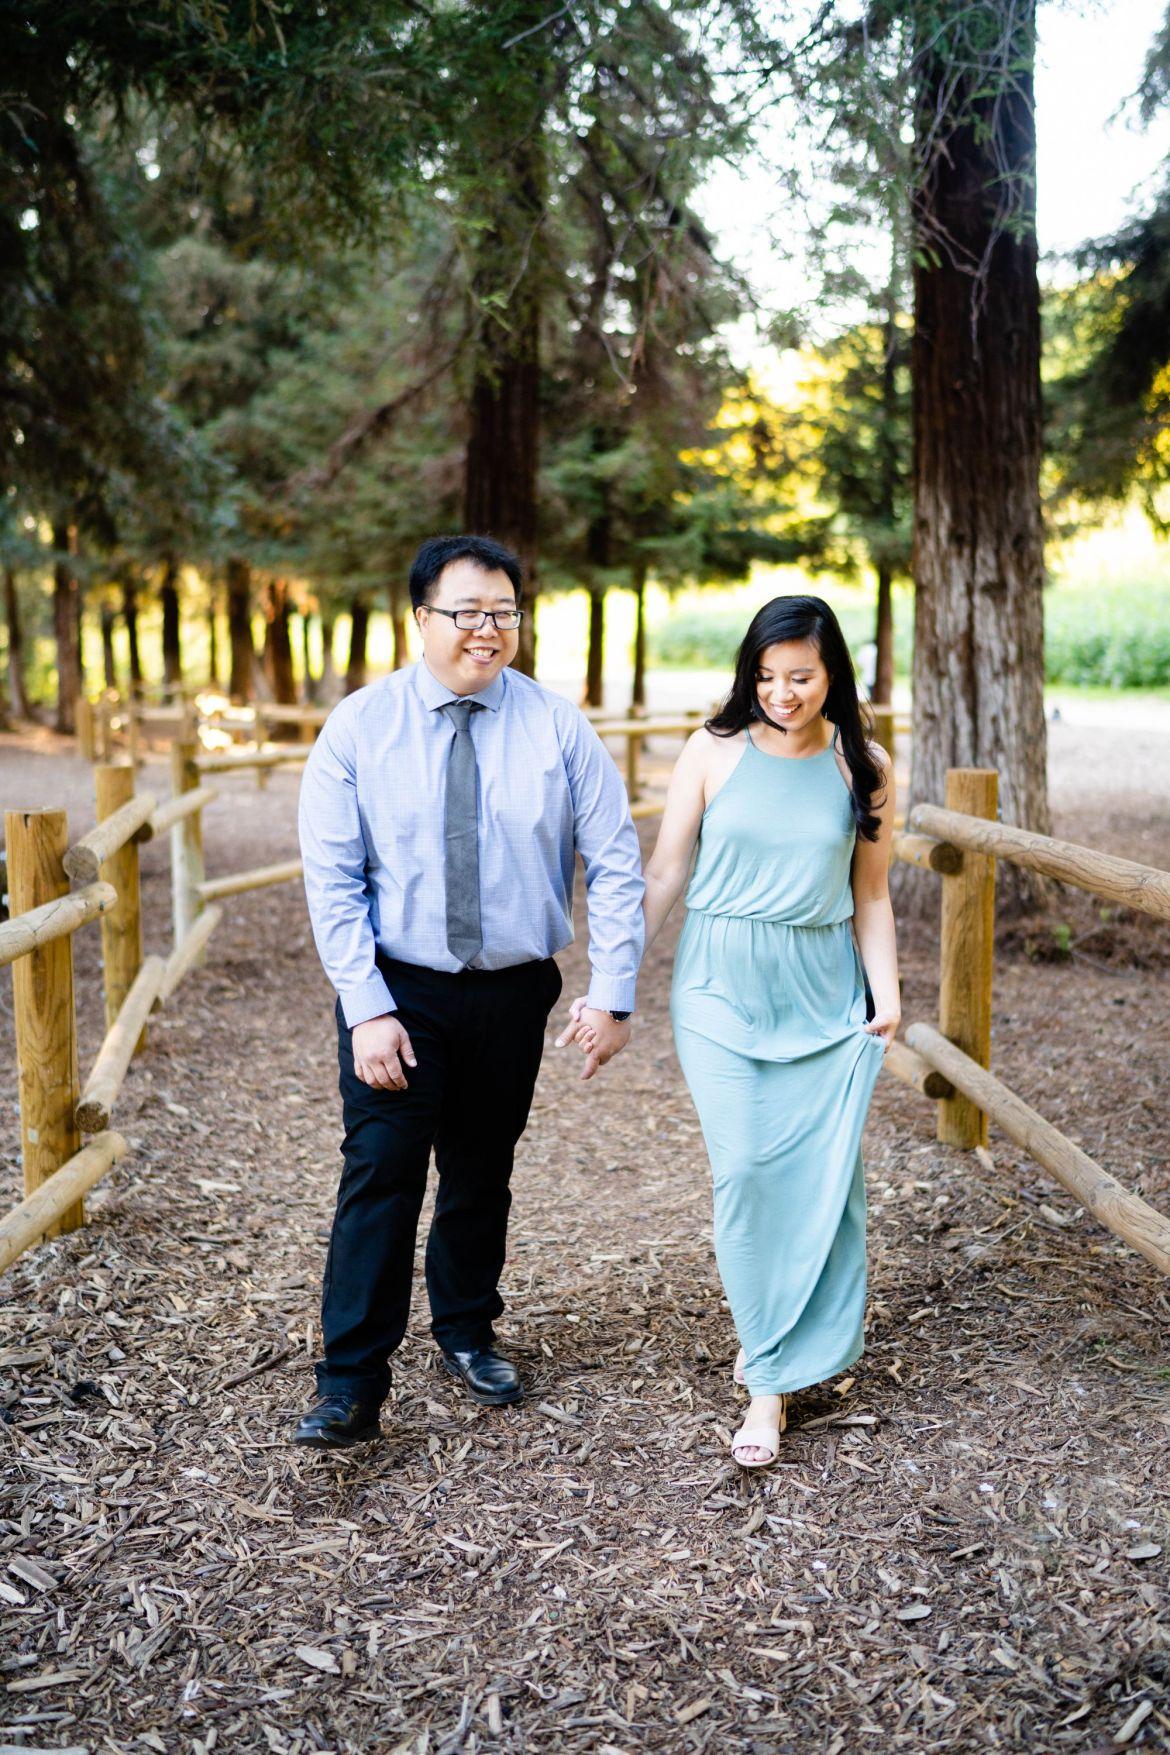 Rowland Heights Wedding Photographer 22